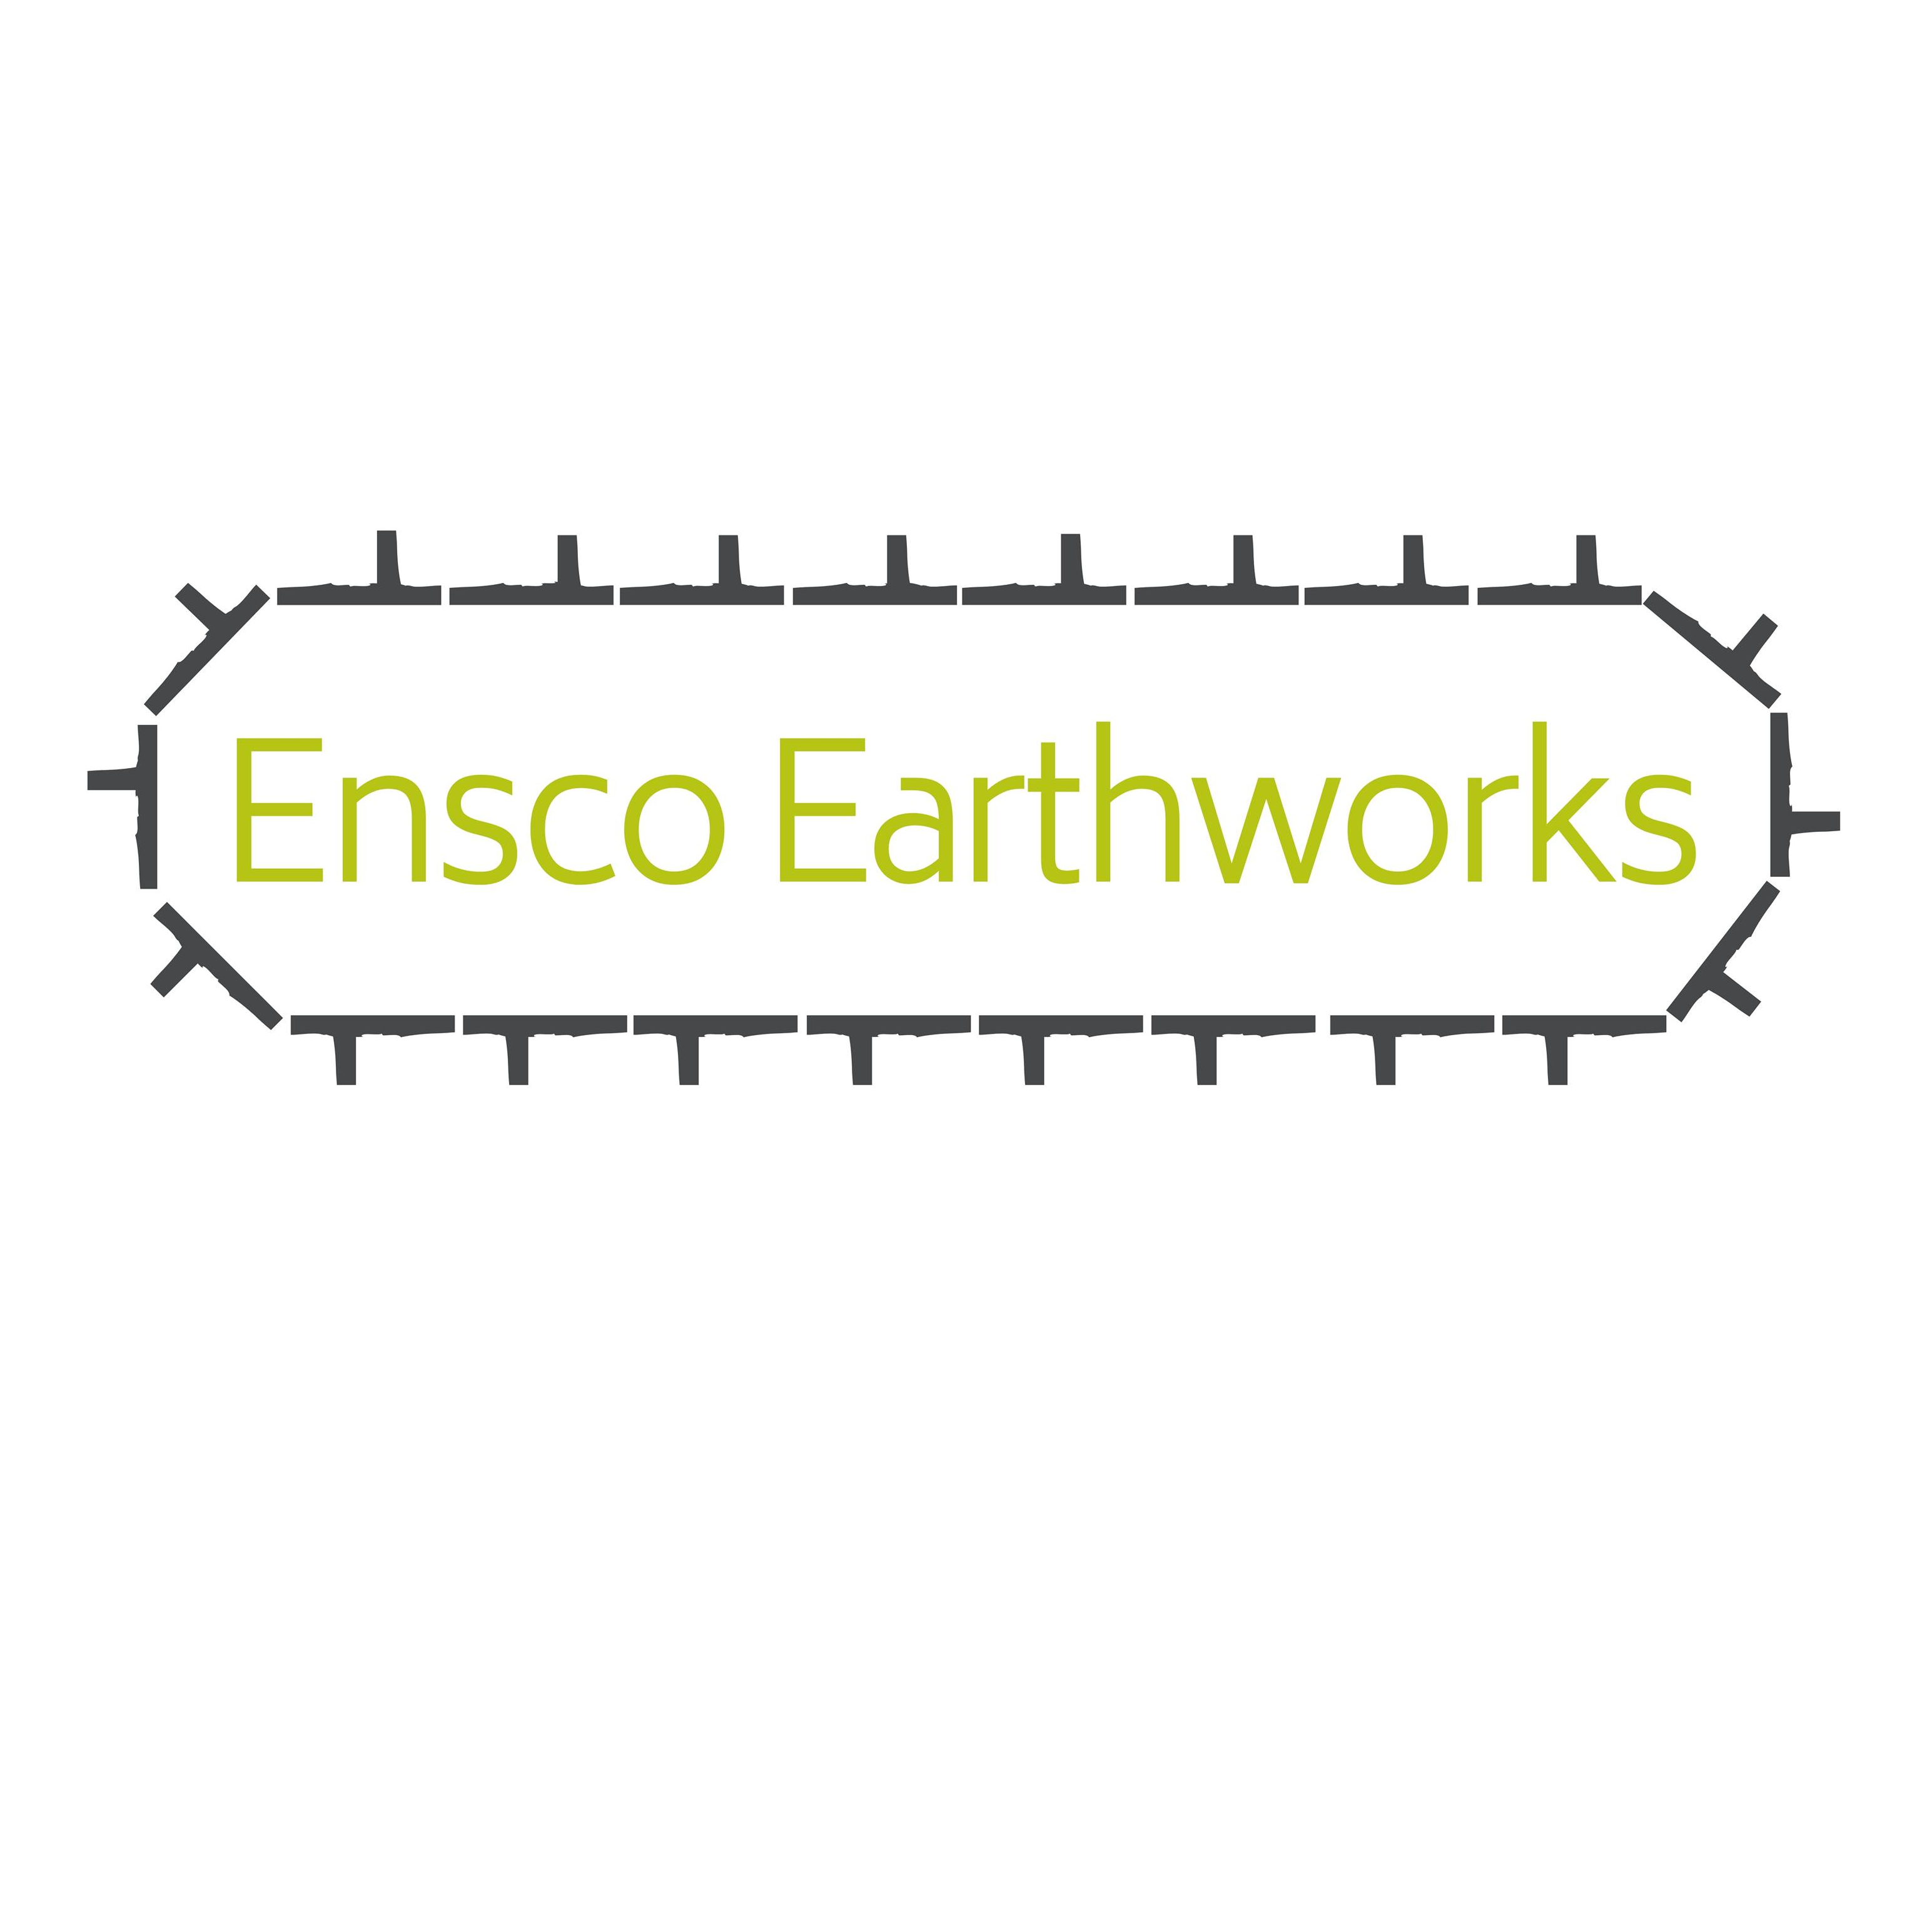 Ensco Earthworks